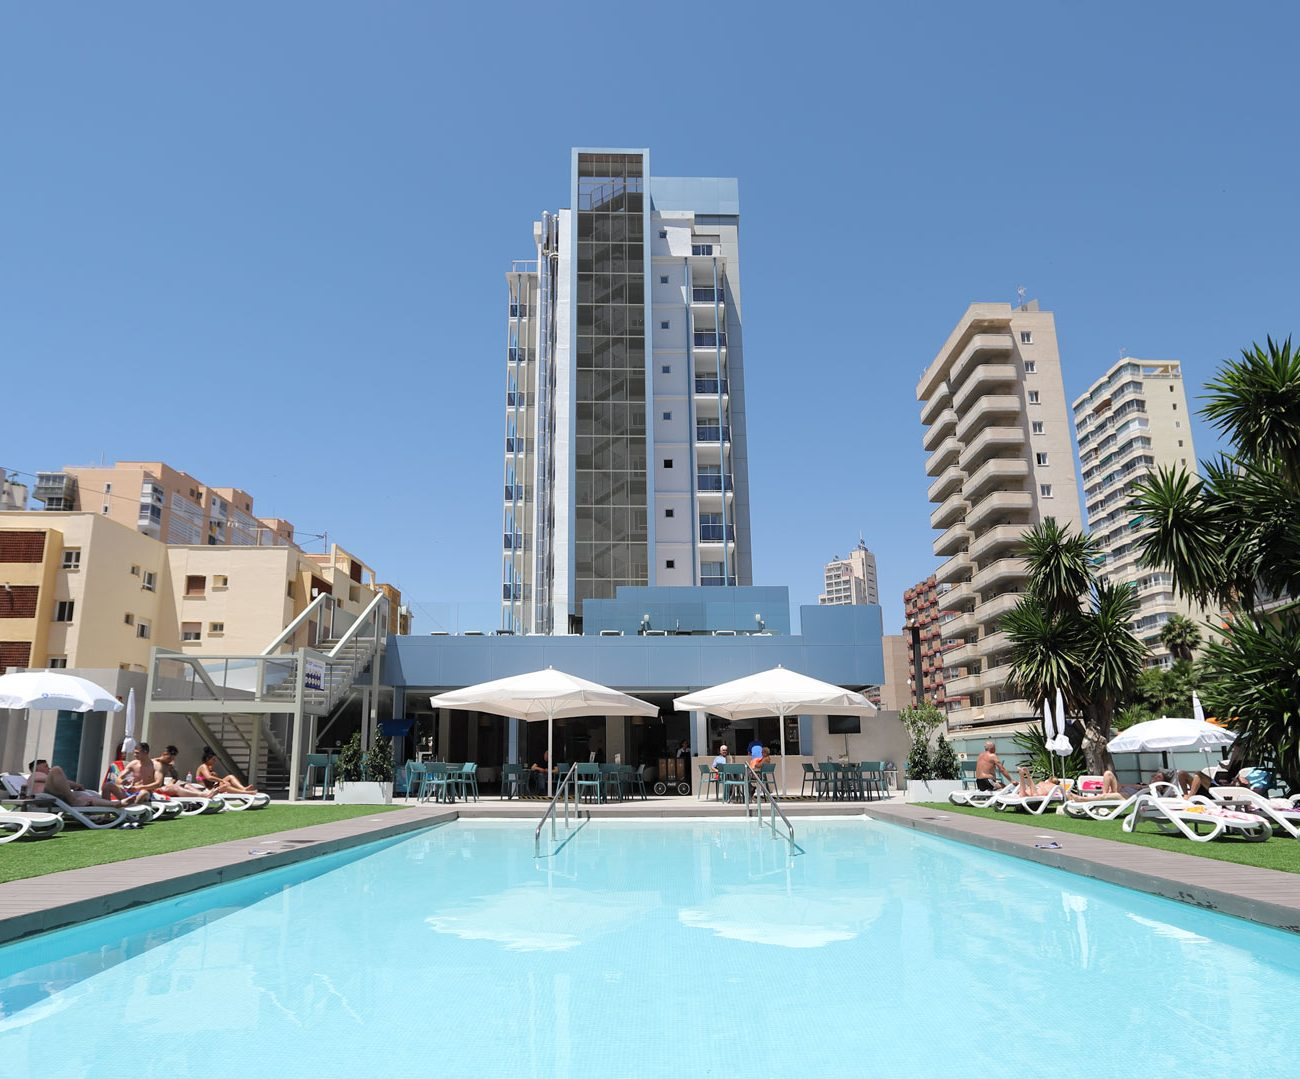 Hotel Benidorm Centre1